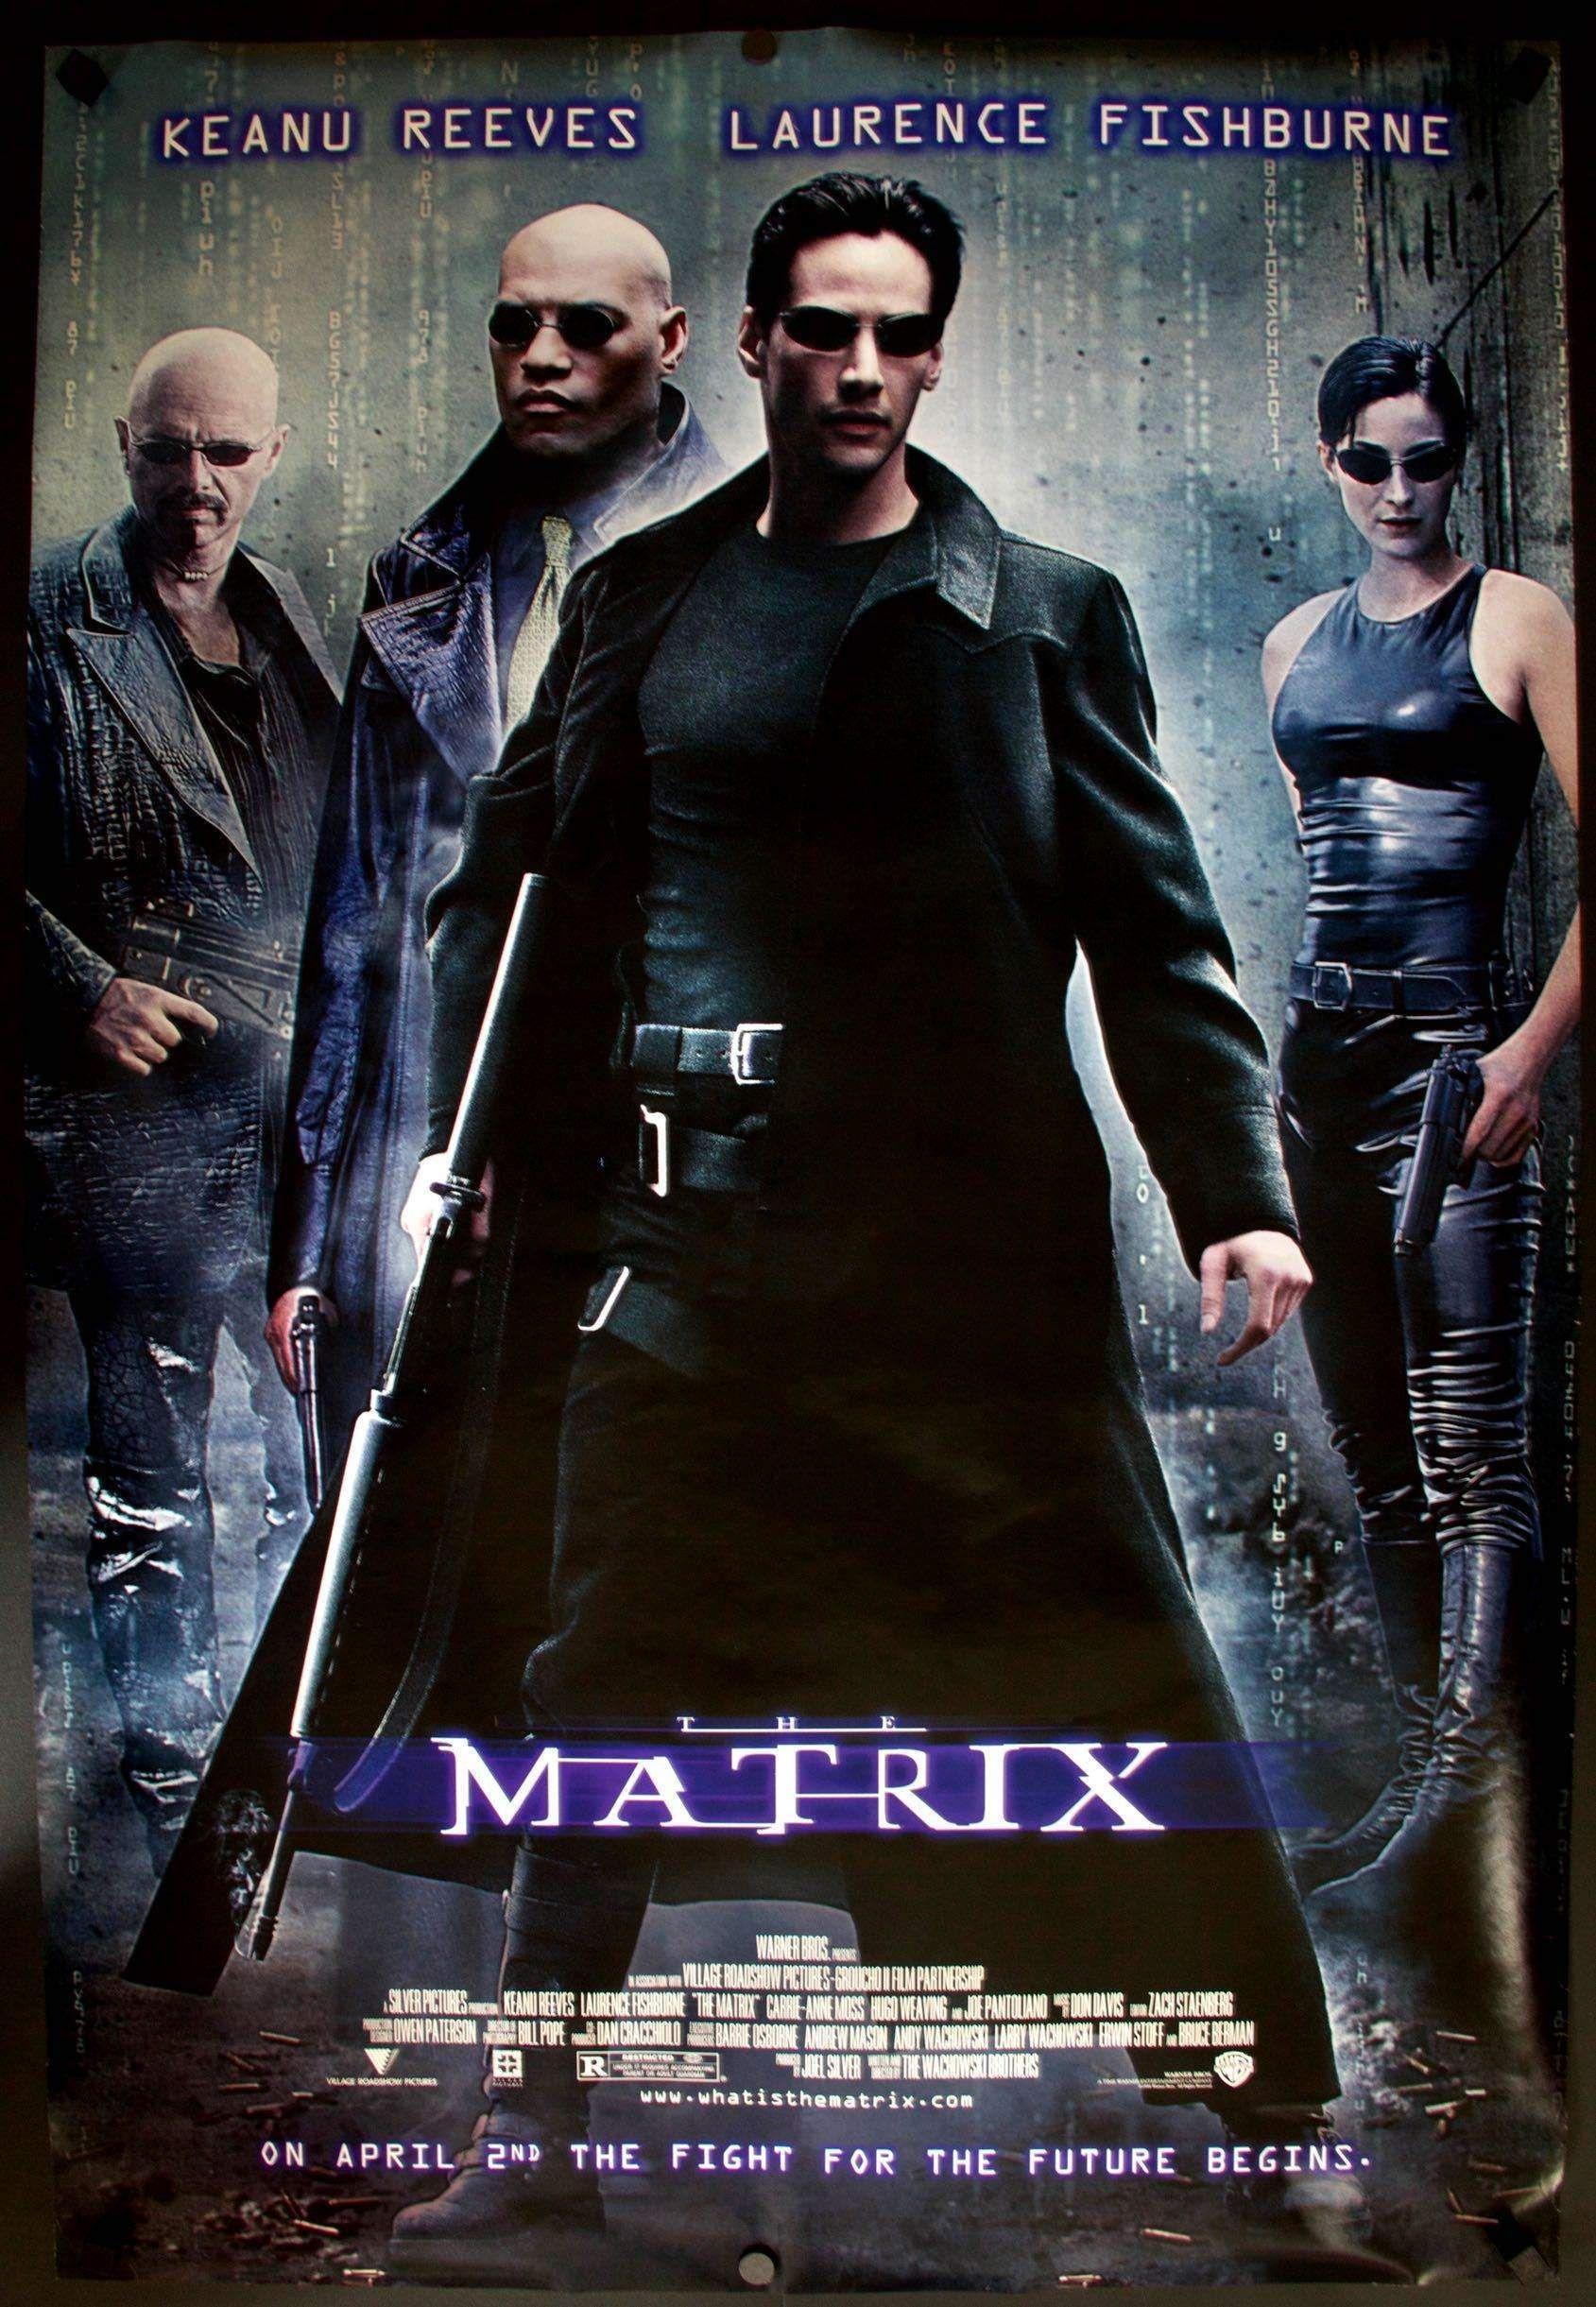 The Matrix The matrix movie, Matrix film, Best movie posters